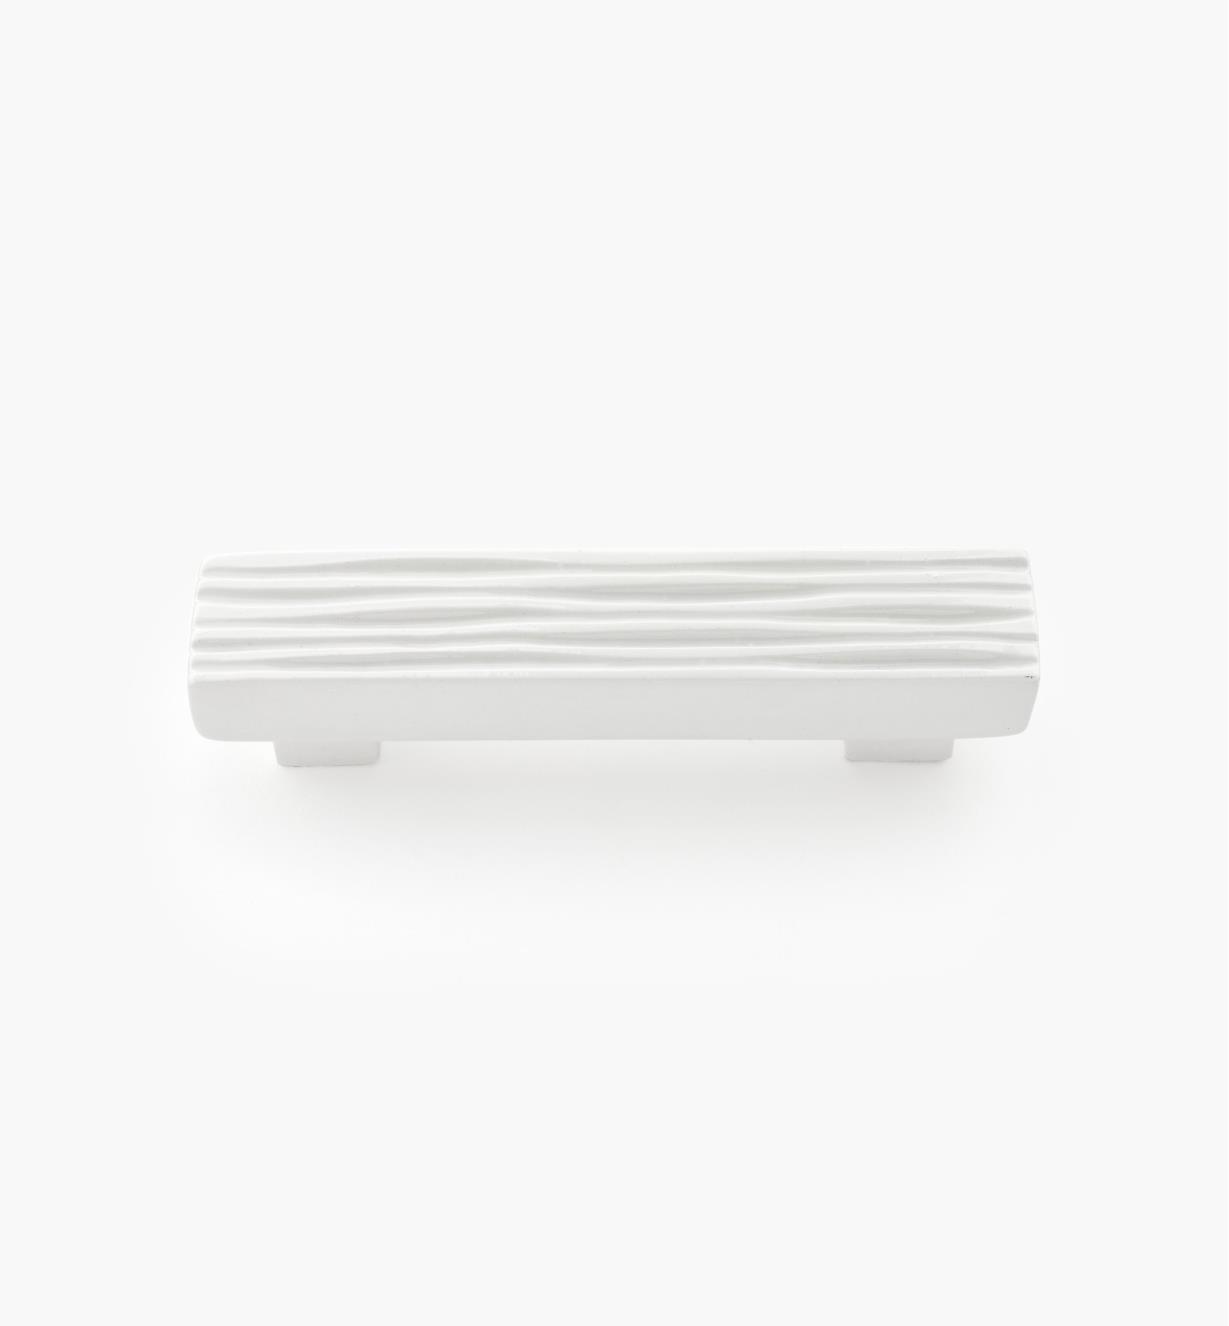 01W0532 - Ibiza Hardware - Handle